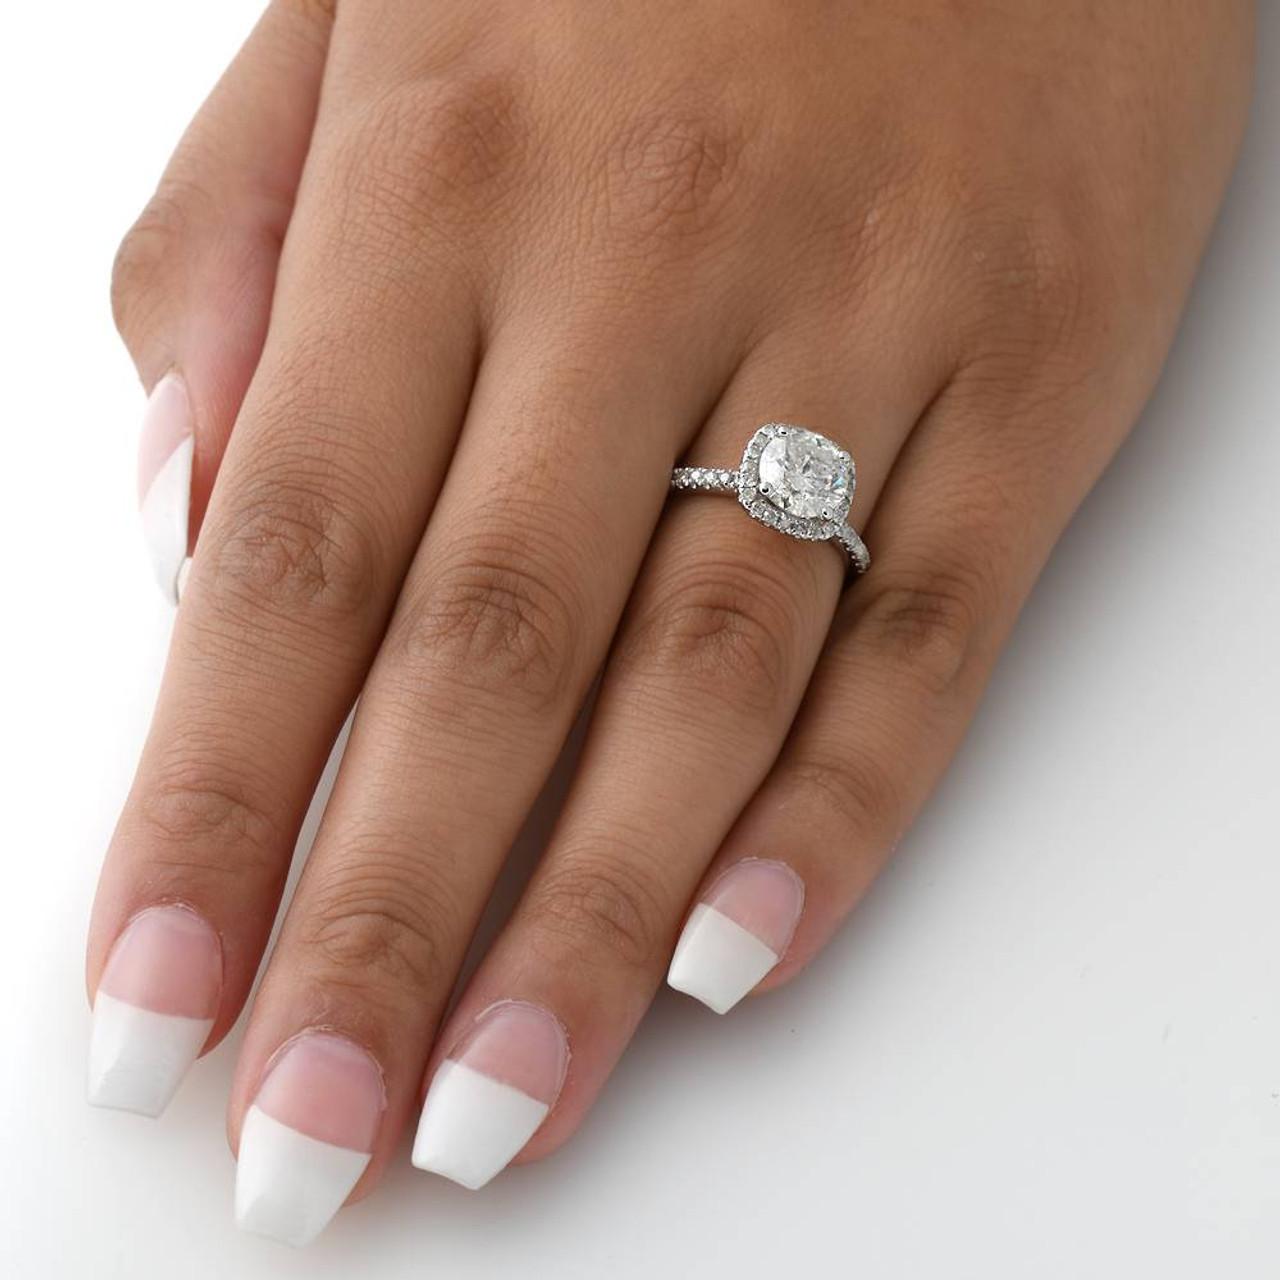 2 Carat Cushion Halo Diamond Engagement Ring 14K White Gold